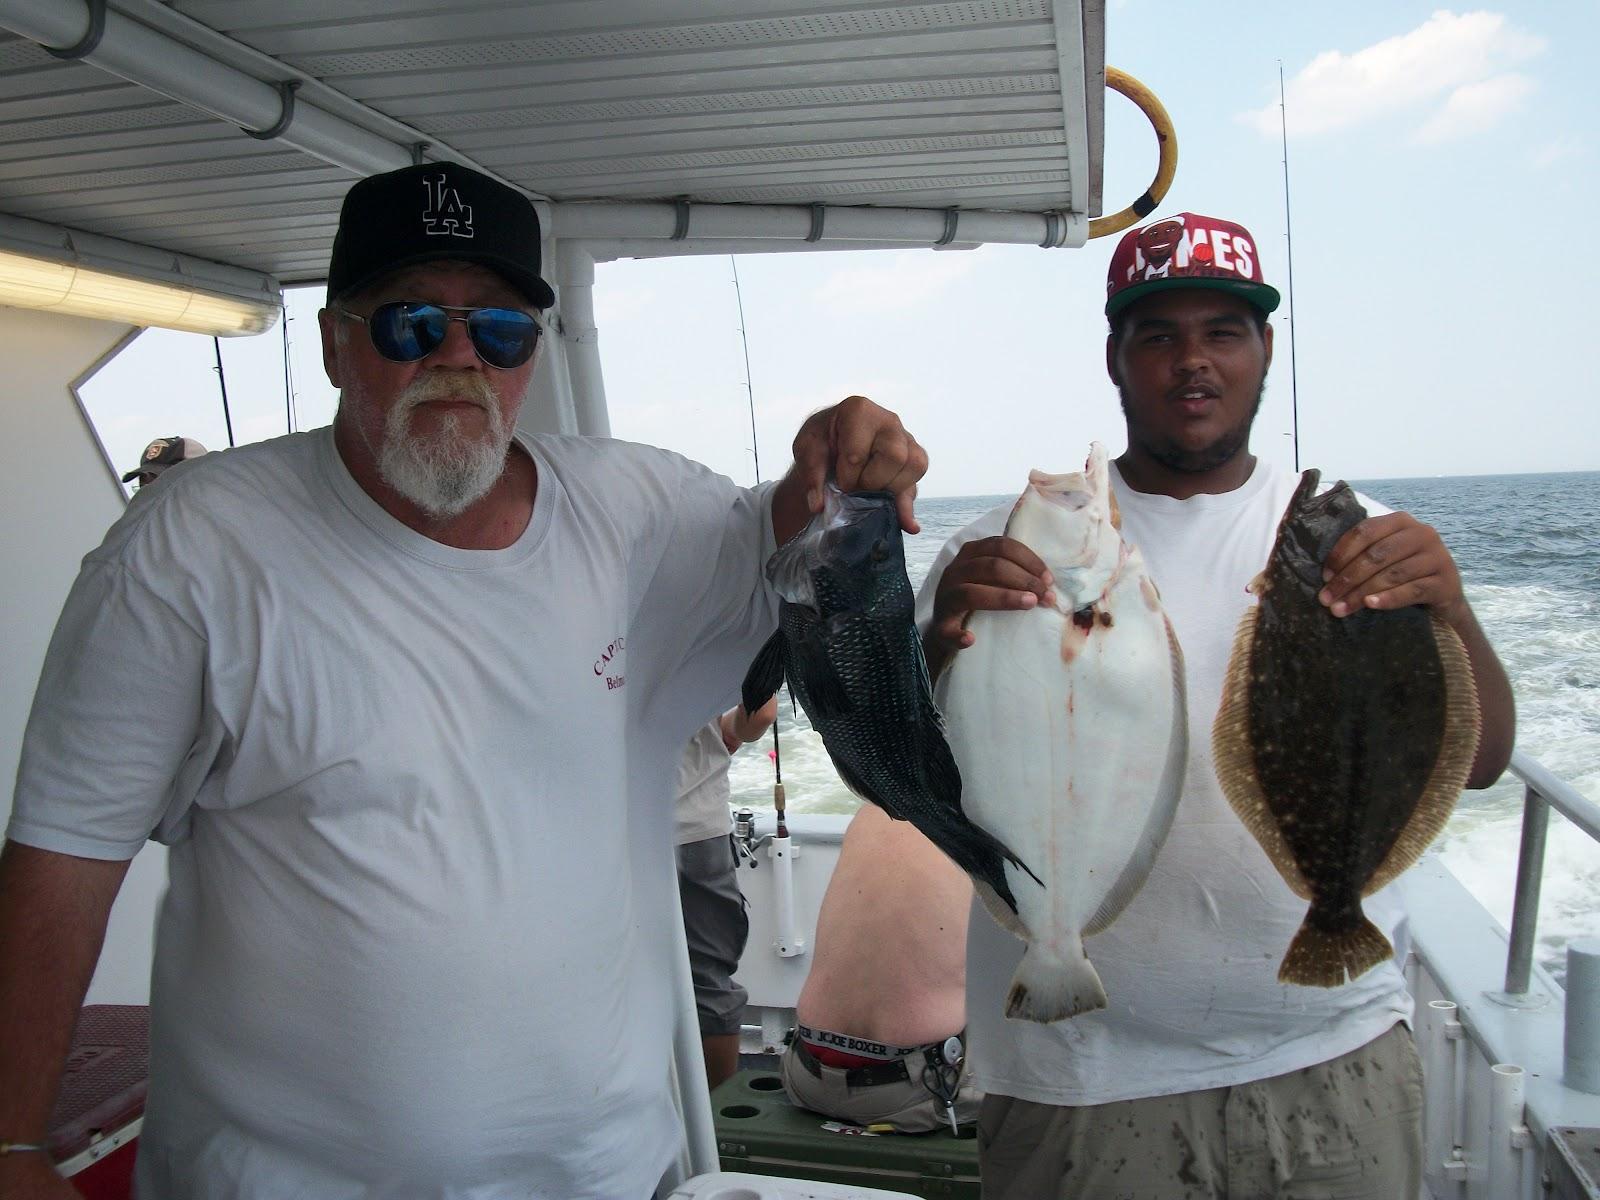 Capt cal belmar good day of fishing 8 19 12 for Belmar fishing charters